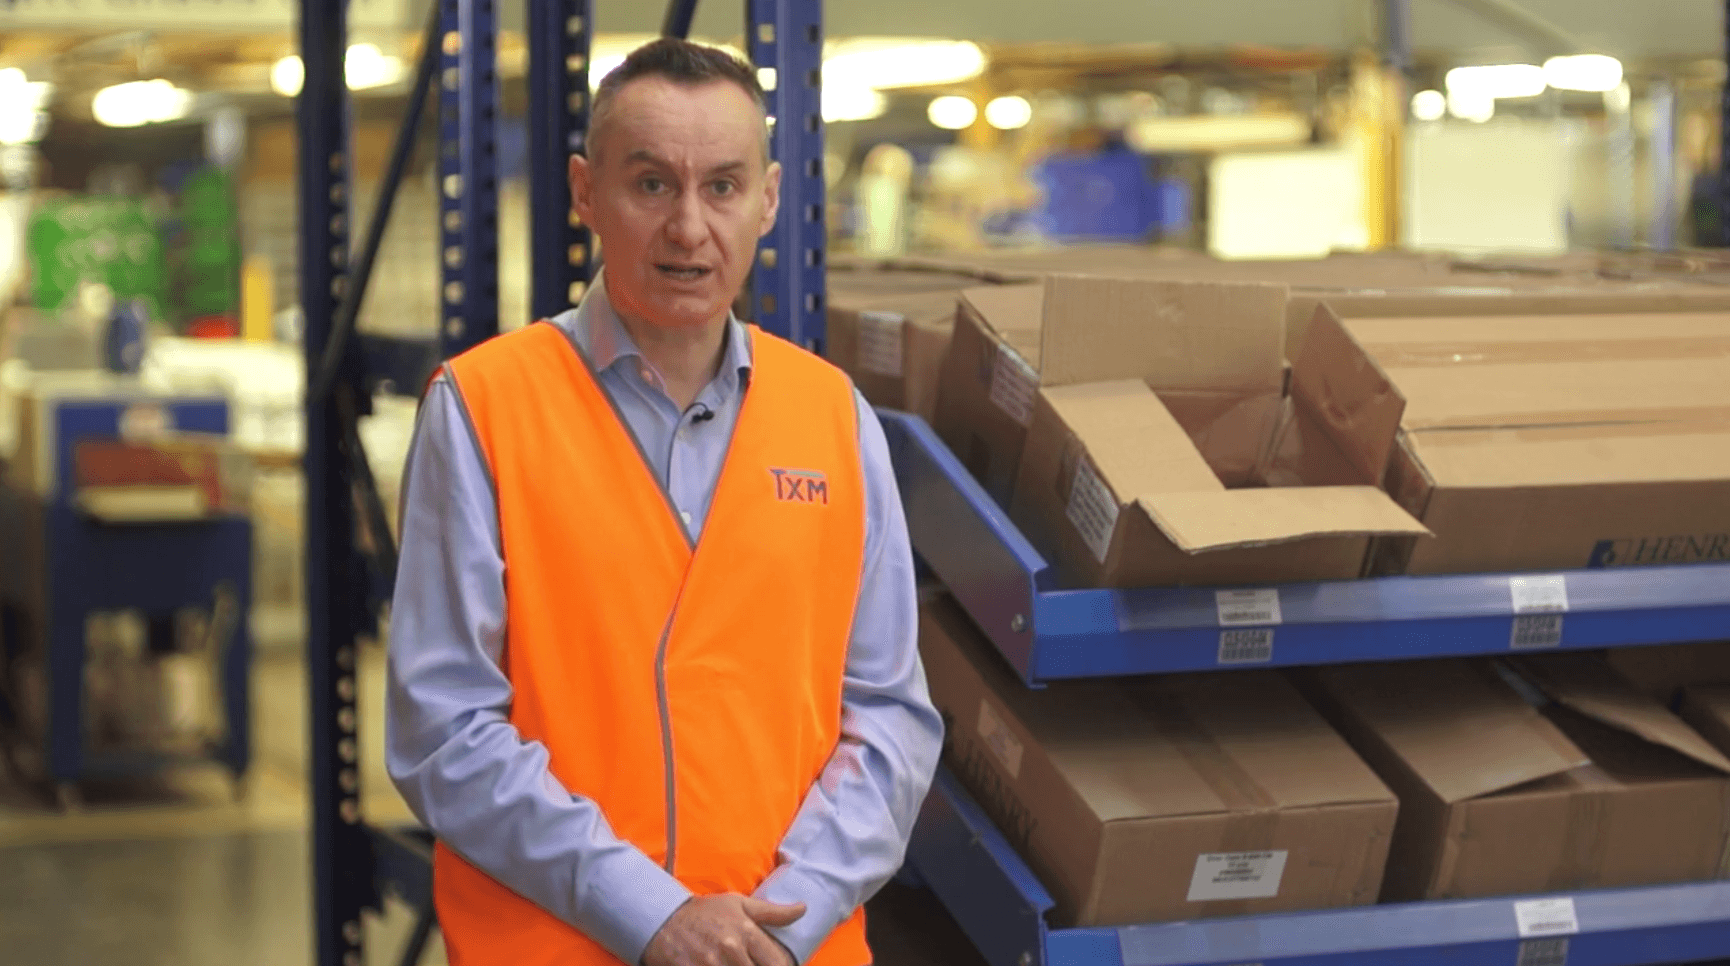 TXM Lean Minute Video – The Most Effective Warehouse Management Technology